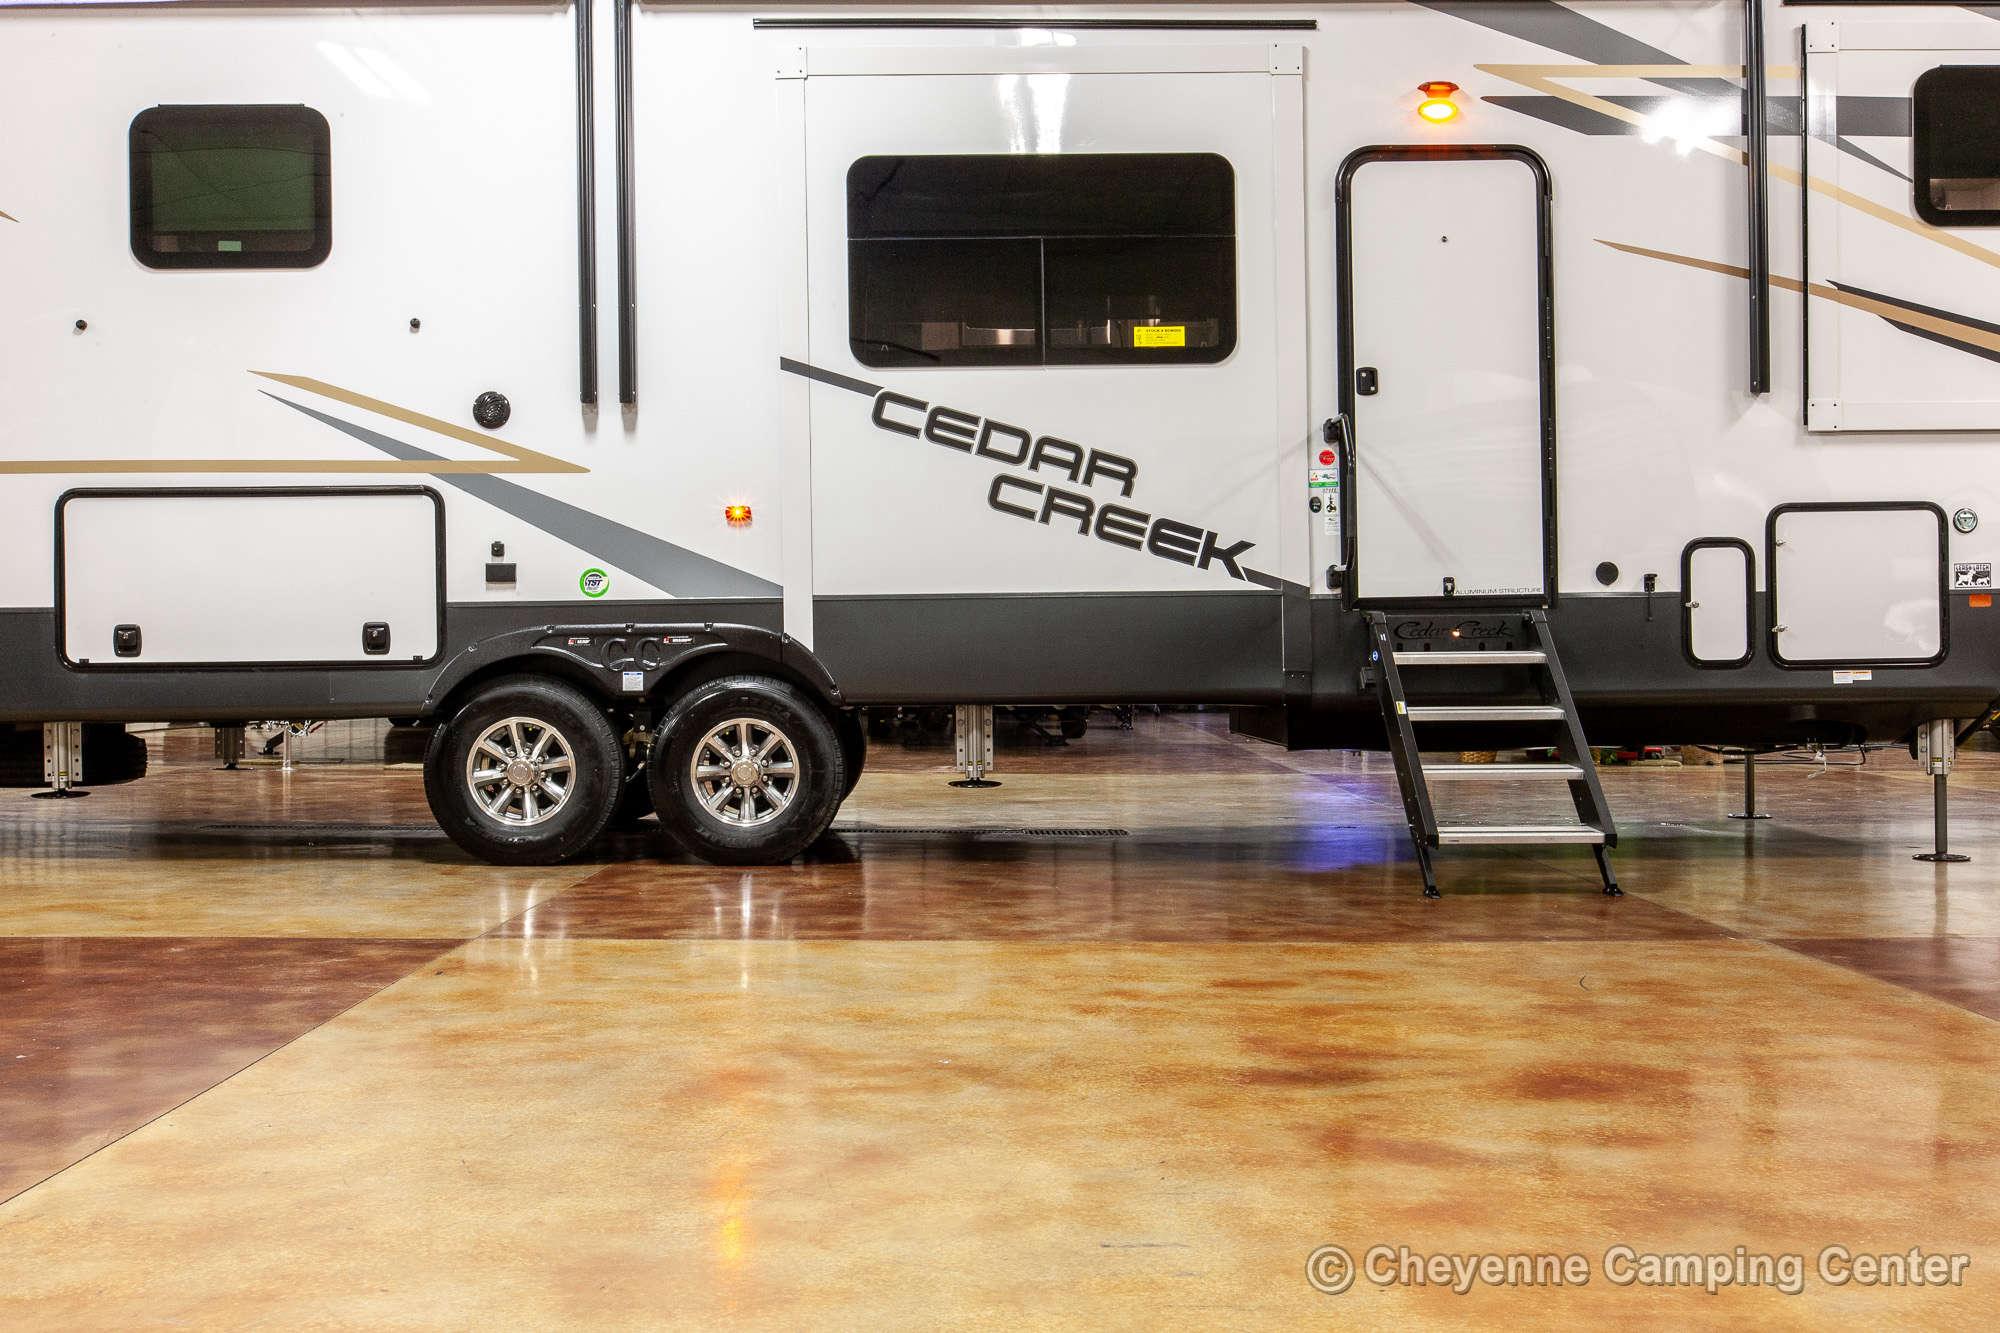 2021 Forest River Cedar Creek 371FL Fifth Wheel Exterior Image